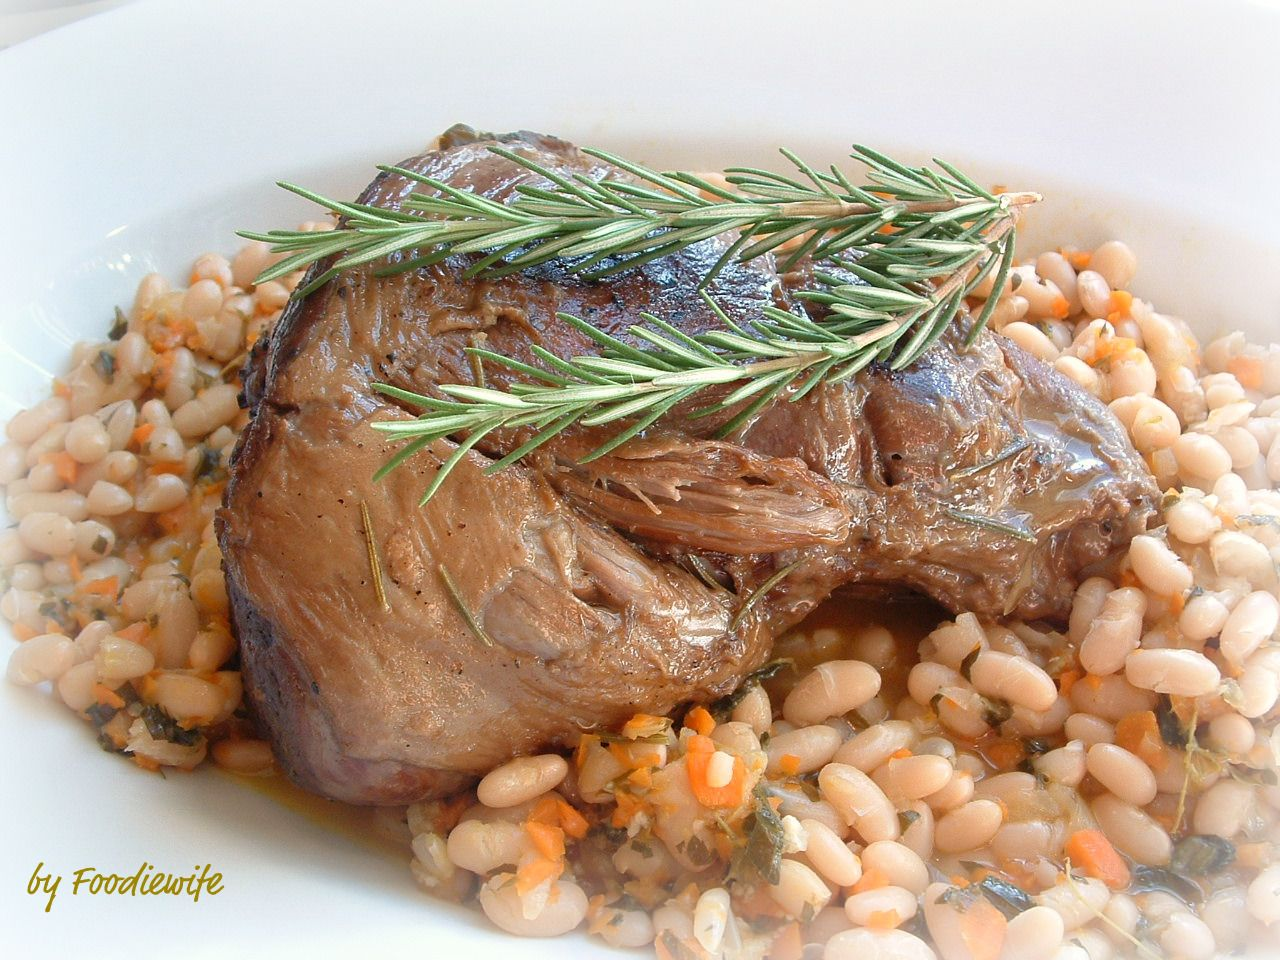 Ina Garten Tenderloin ina garten's braised 4-hour lamb & provencal french beans | ina